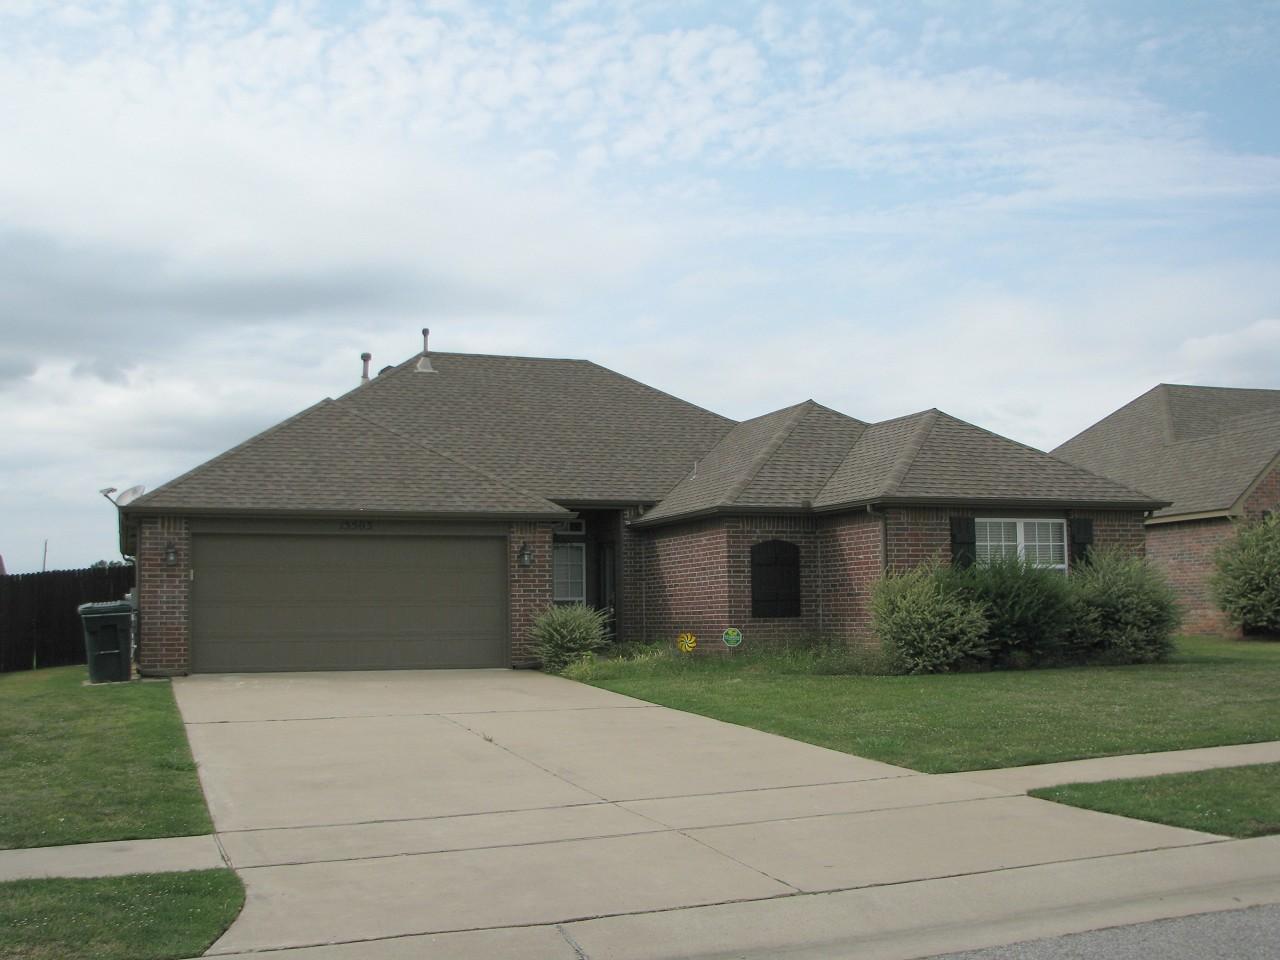 Single Family Home for Sale, ListingId:29916736, location: 15503 E 91st Street North Owasso 74055